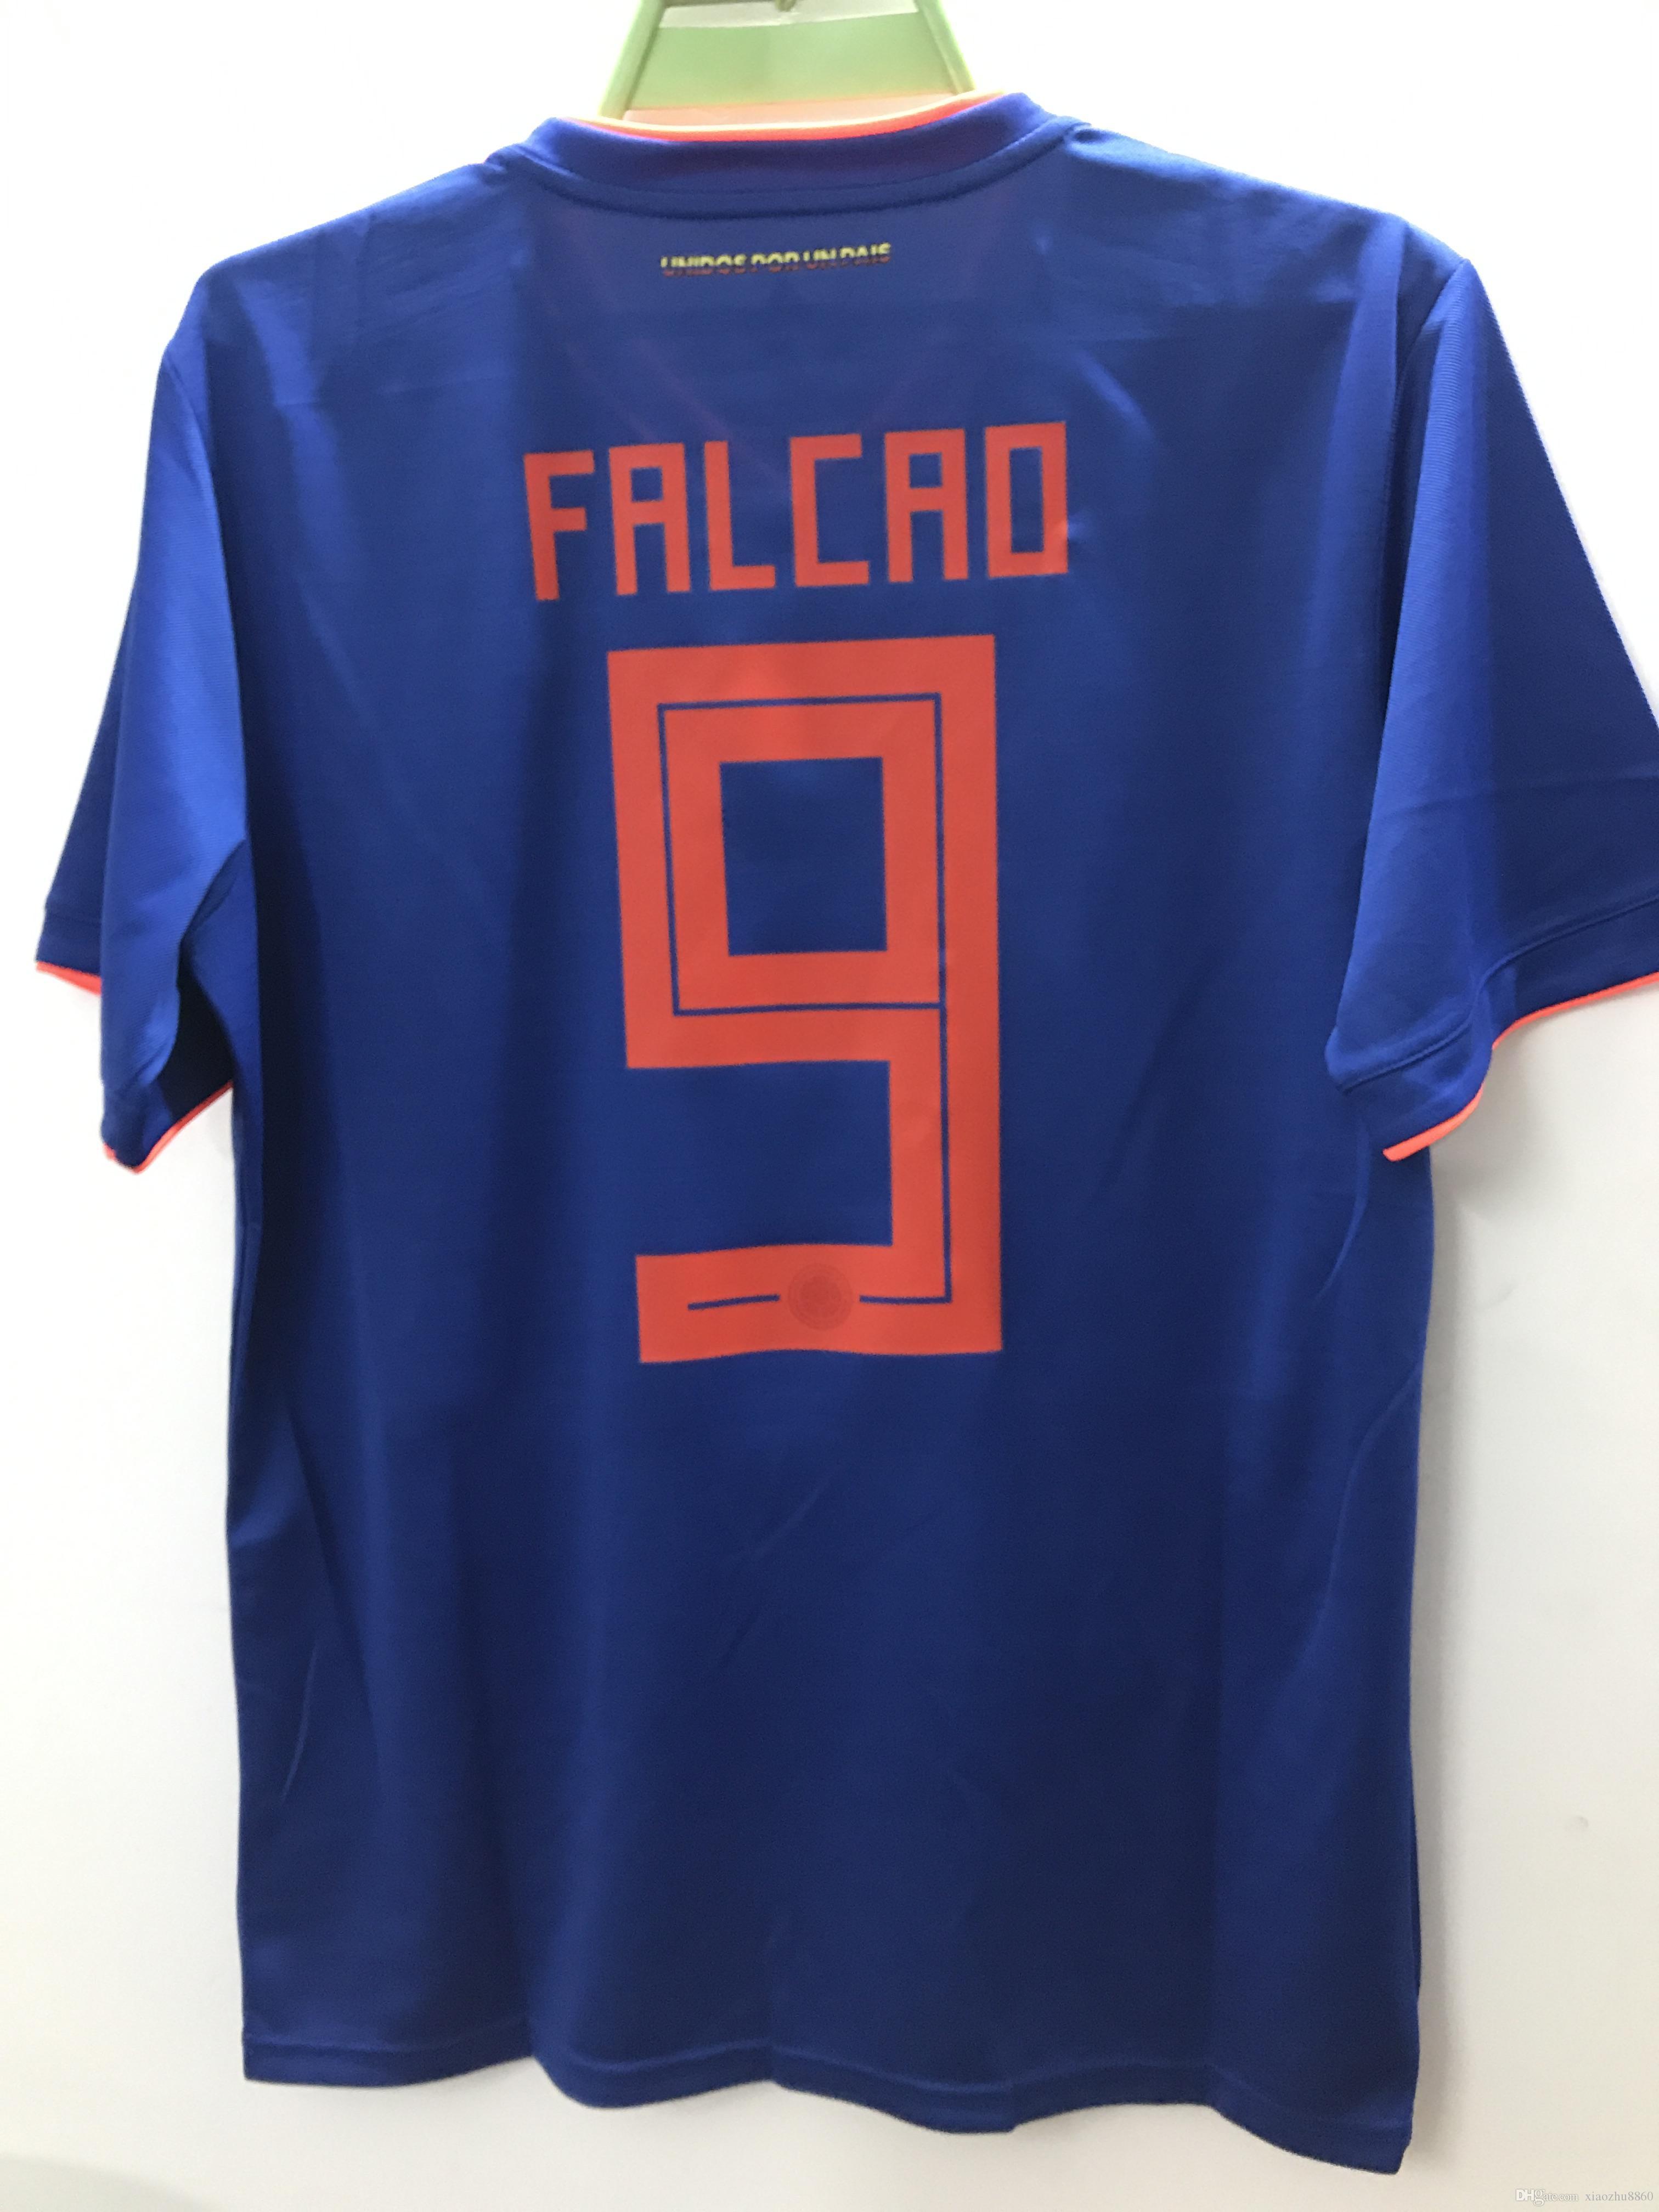 41034fe7b Buy Colombia Football Shirt Uk